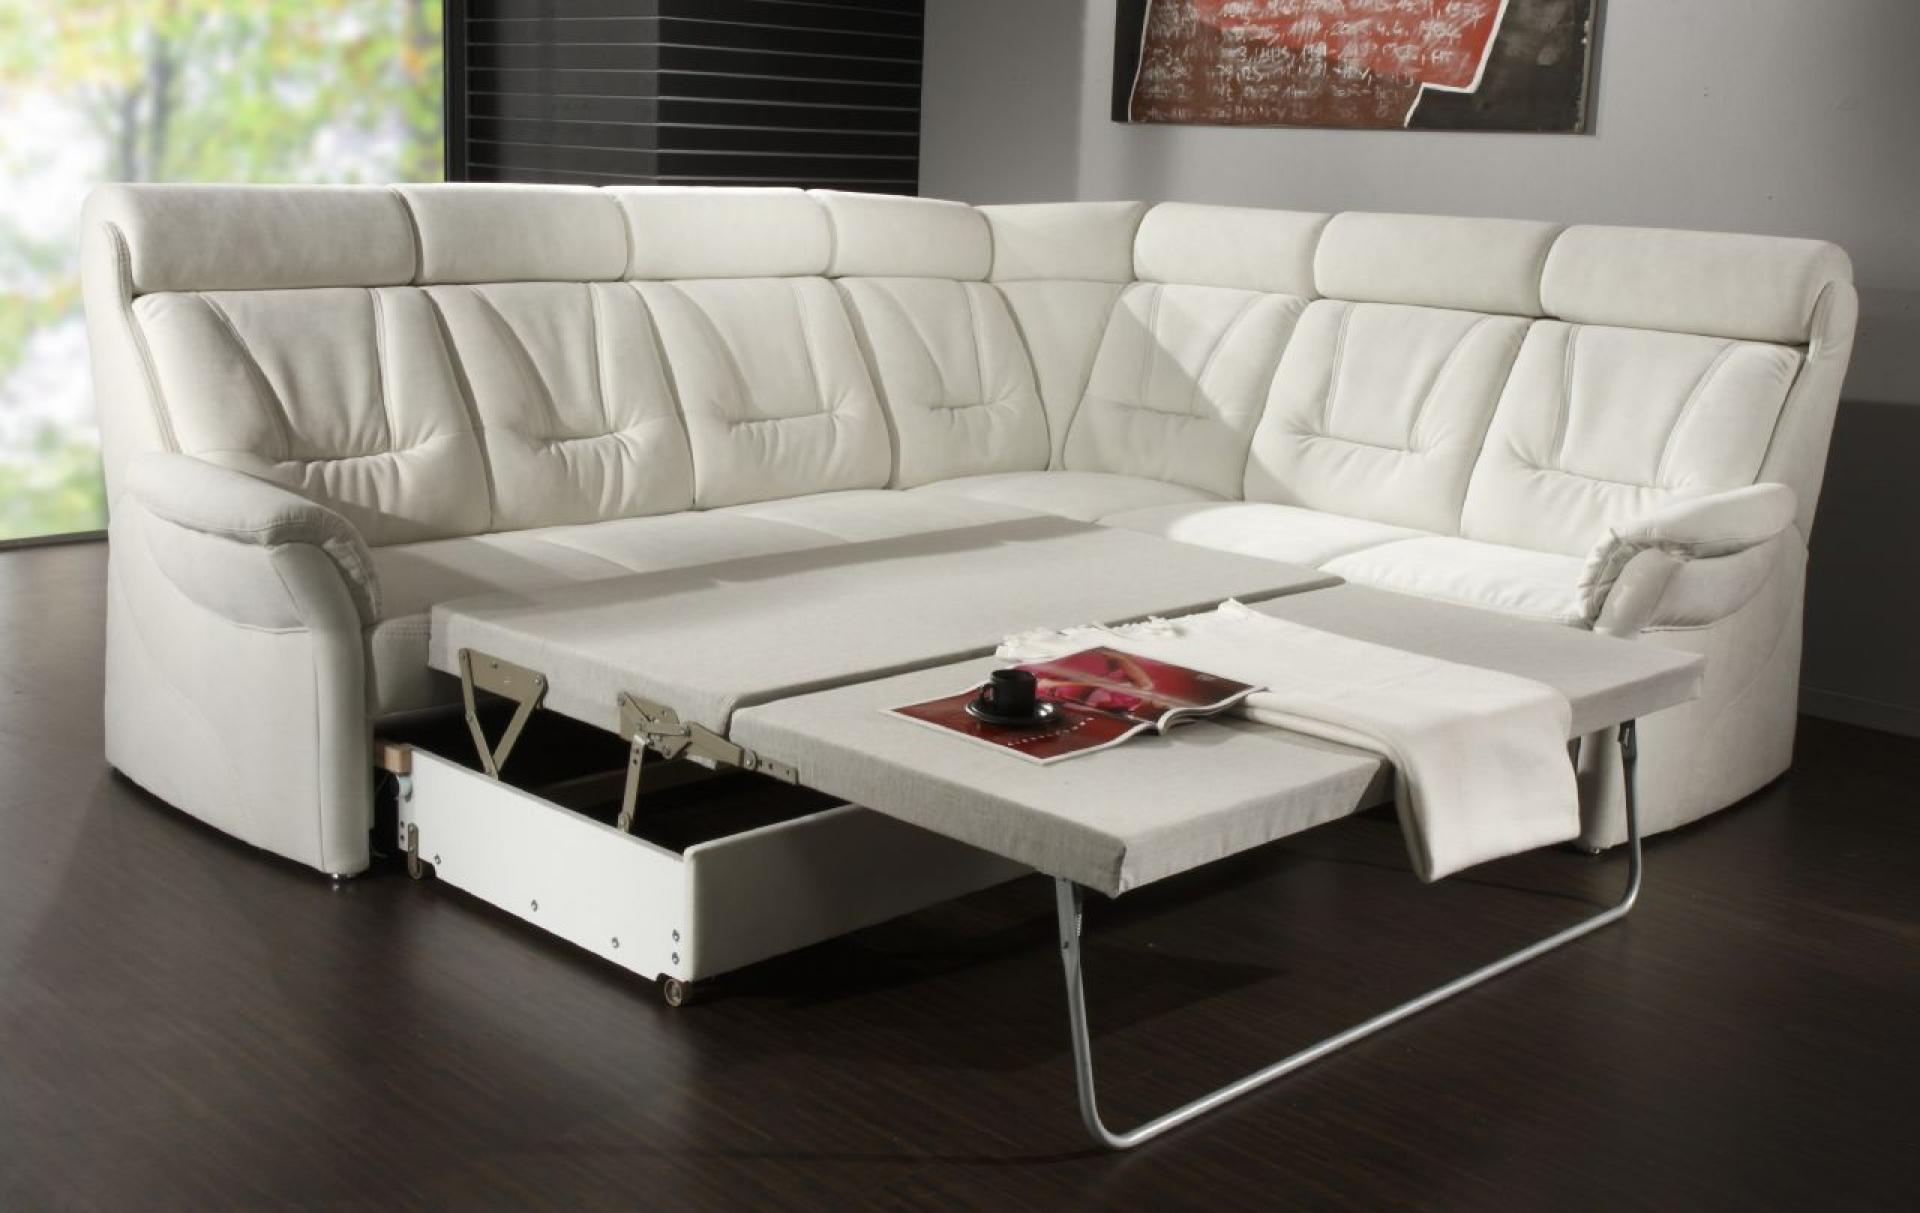 canap lit confortable ikea id e inspirante. Black Bedroom Furniture Sets. Home Design Ideas